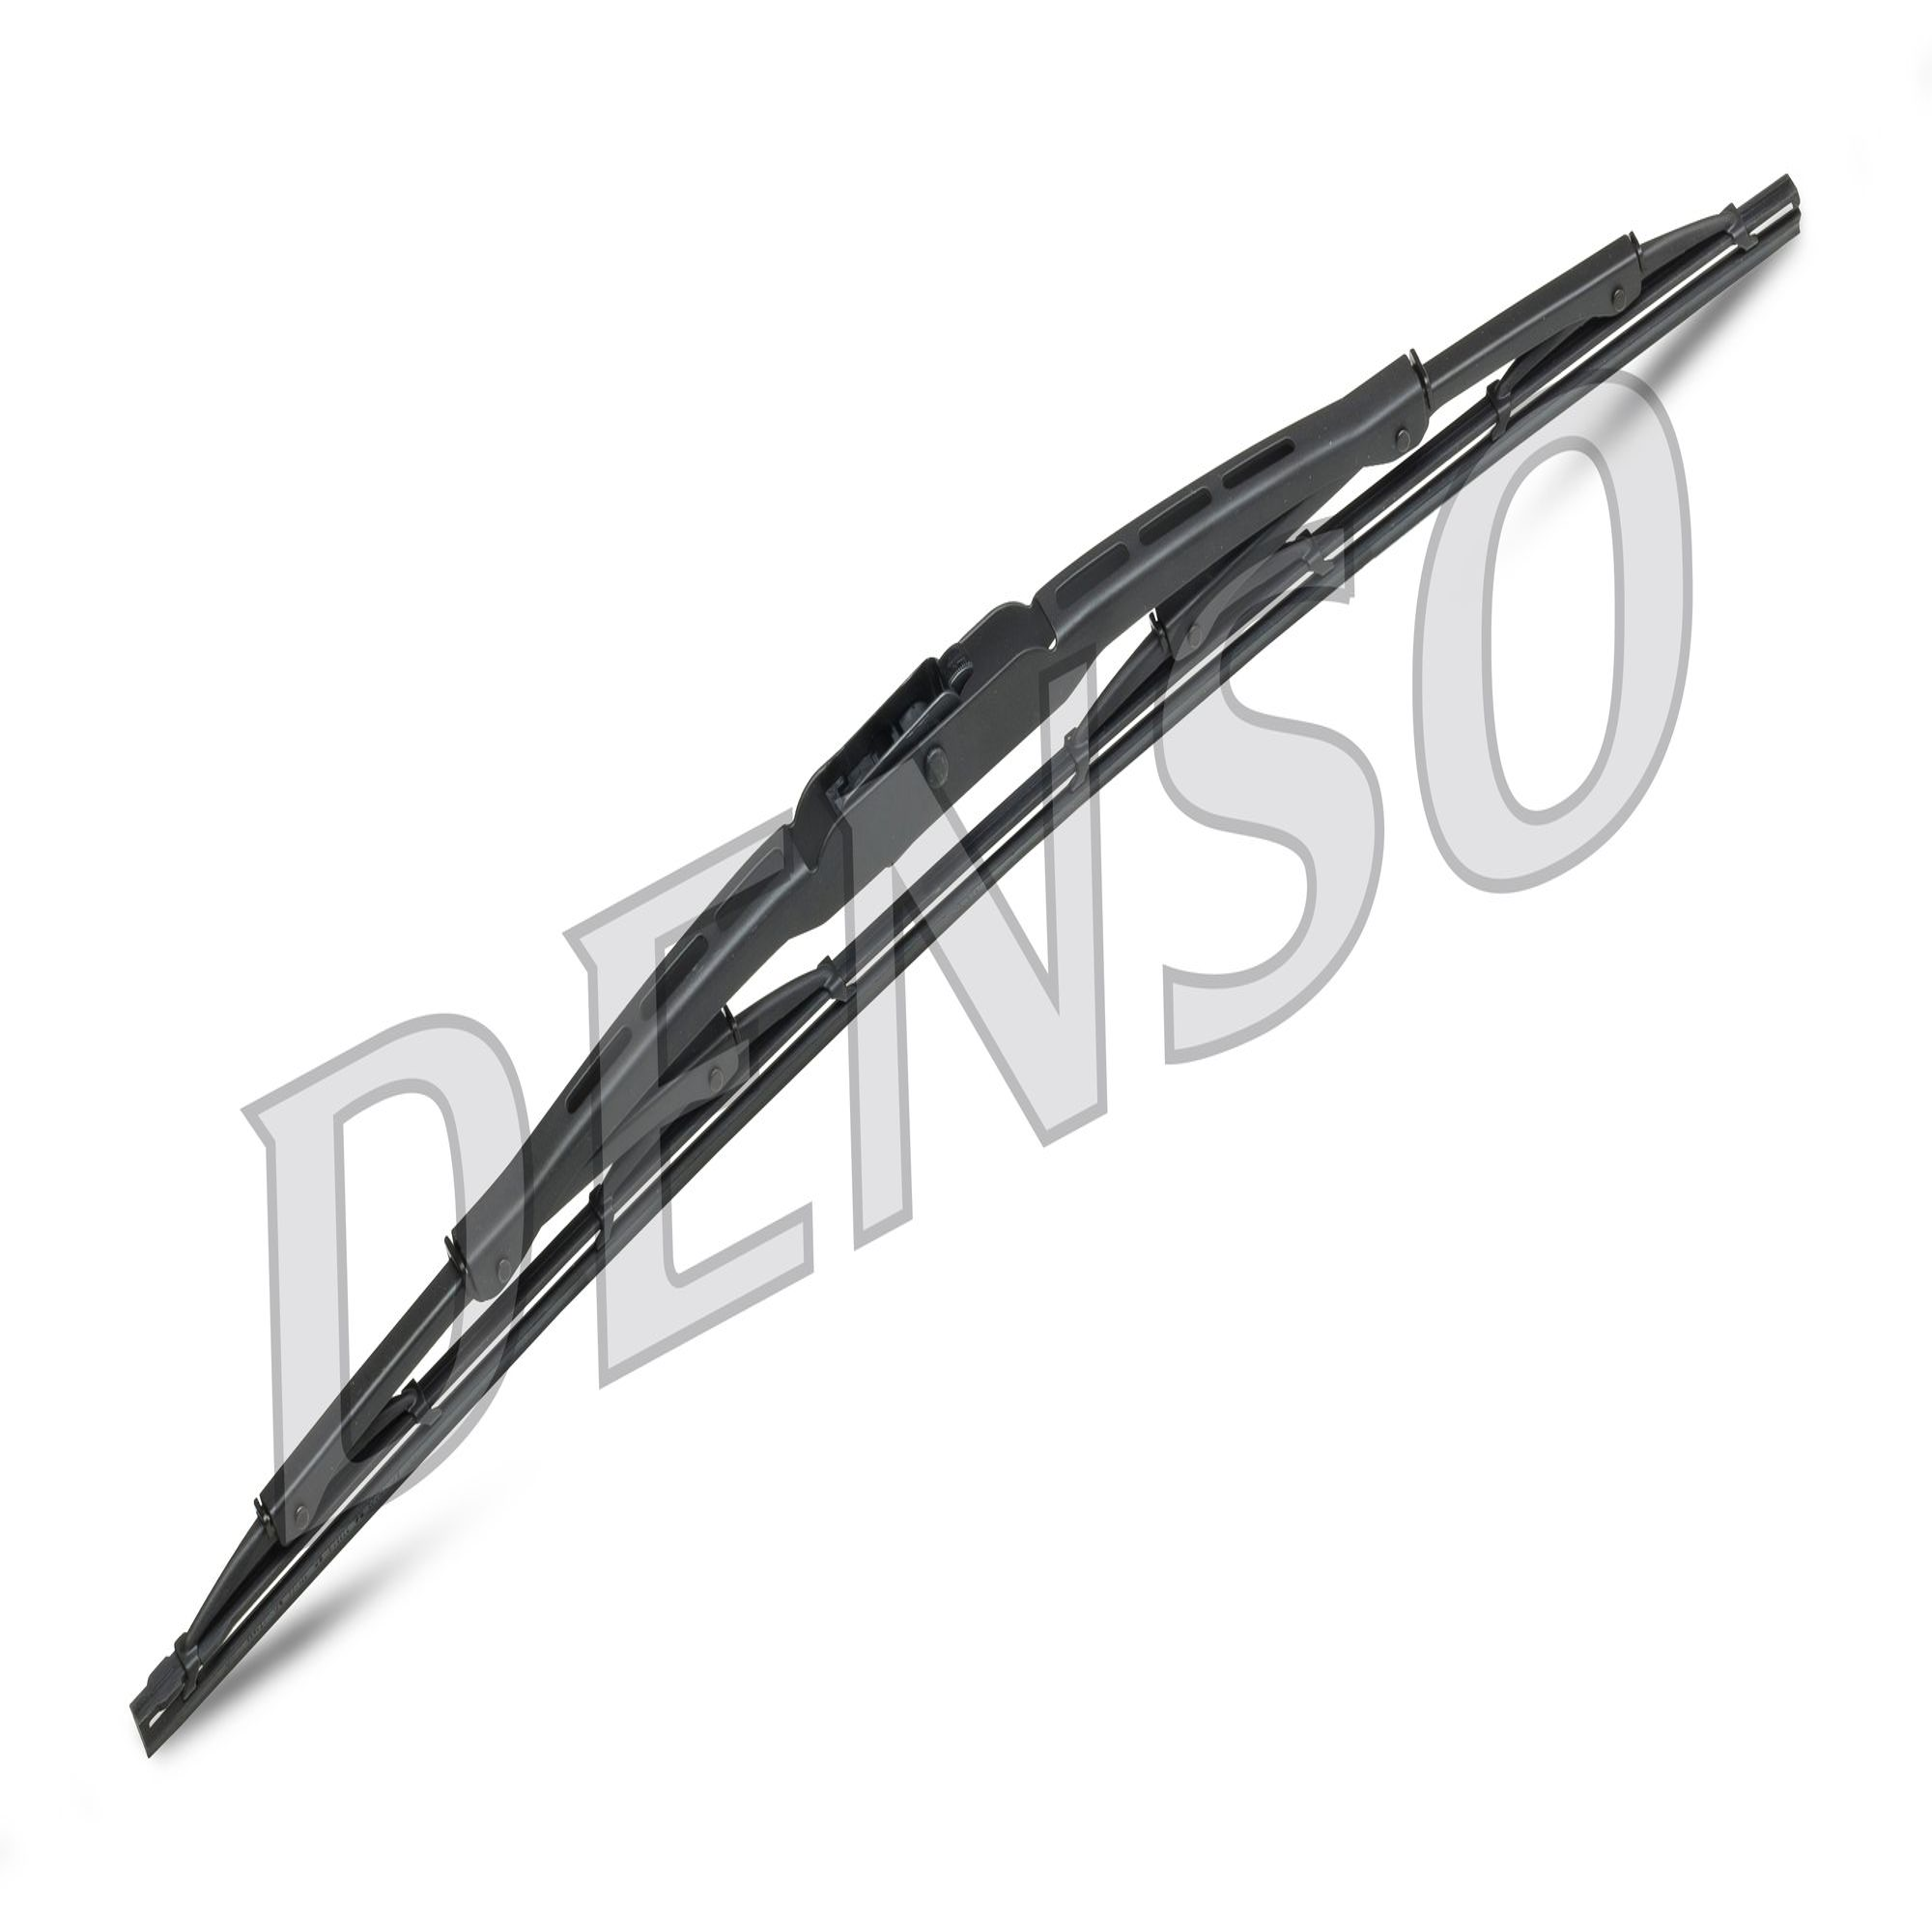 Buy Lambda probe DENSO DOX-0269 Cable Length: 230mm